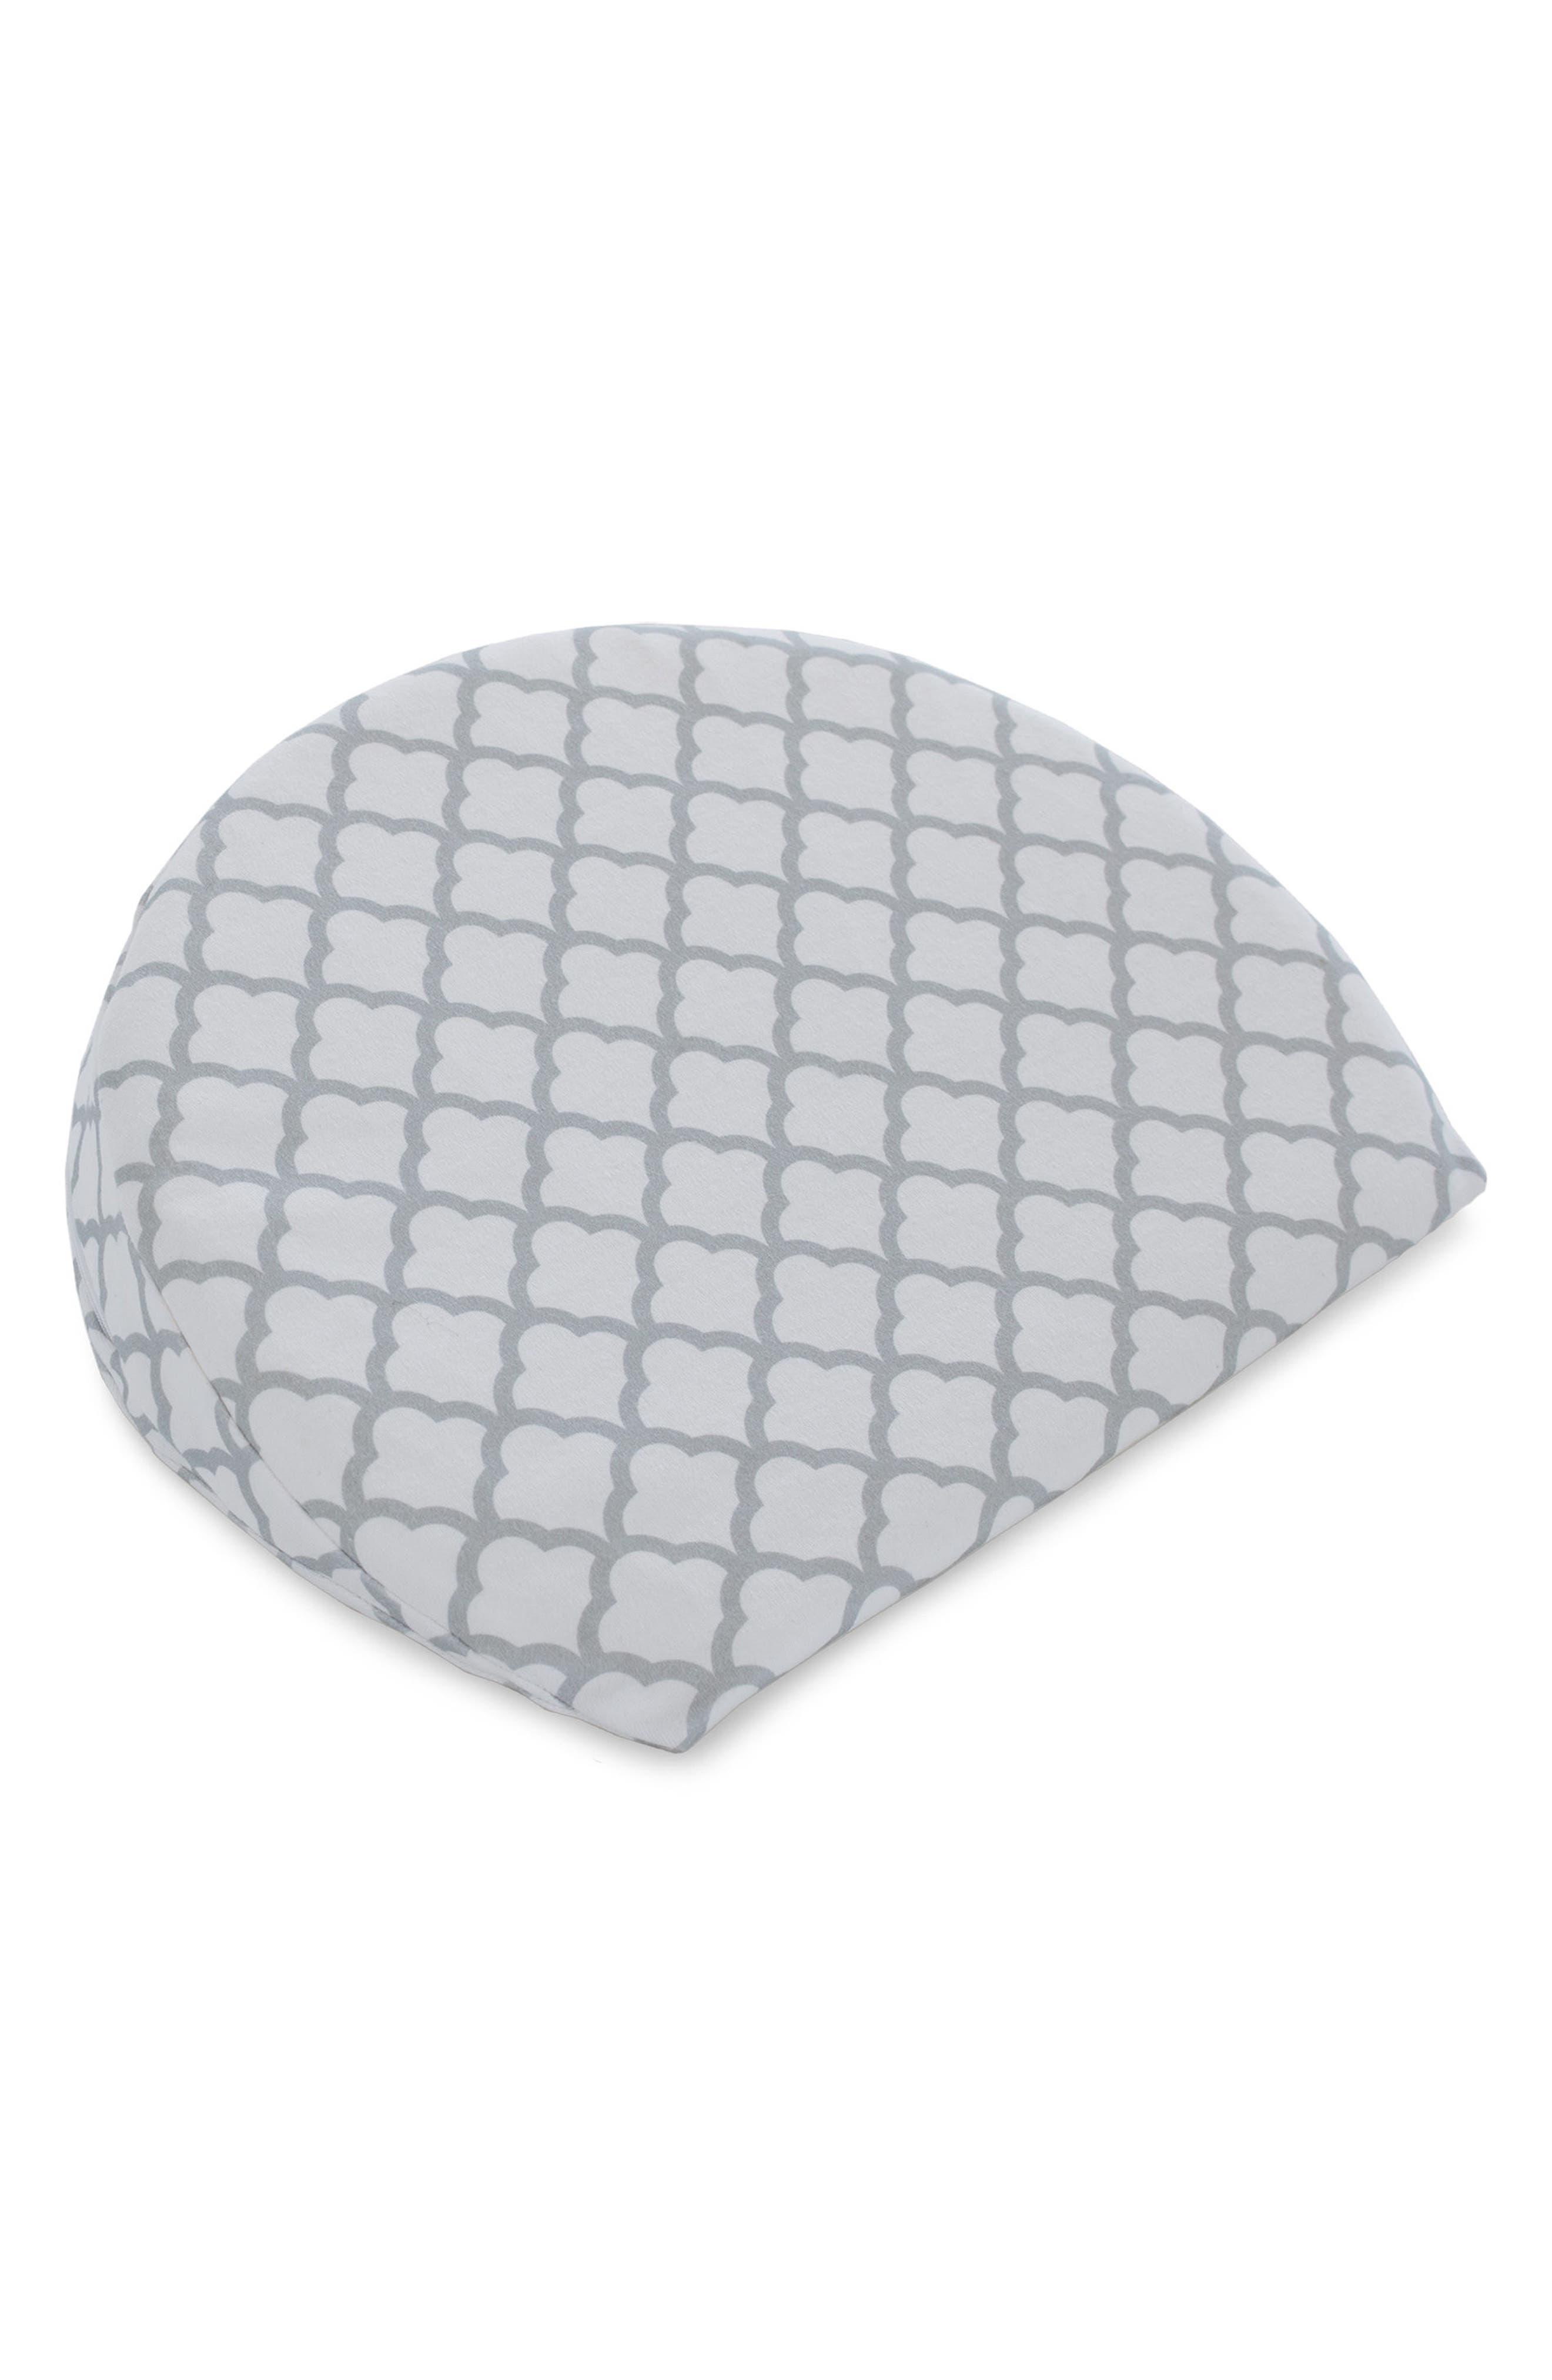 Pregnancy Wedge Cushion & Slipcover,                             Alternate thumbnail 3, color,                             WHITE TRELLIS